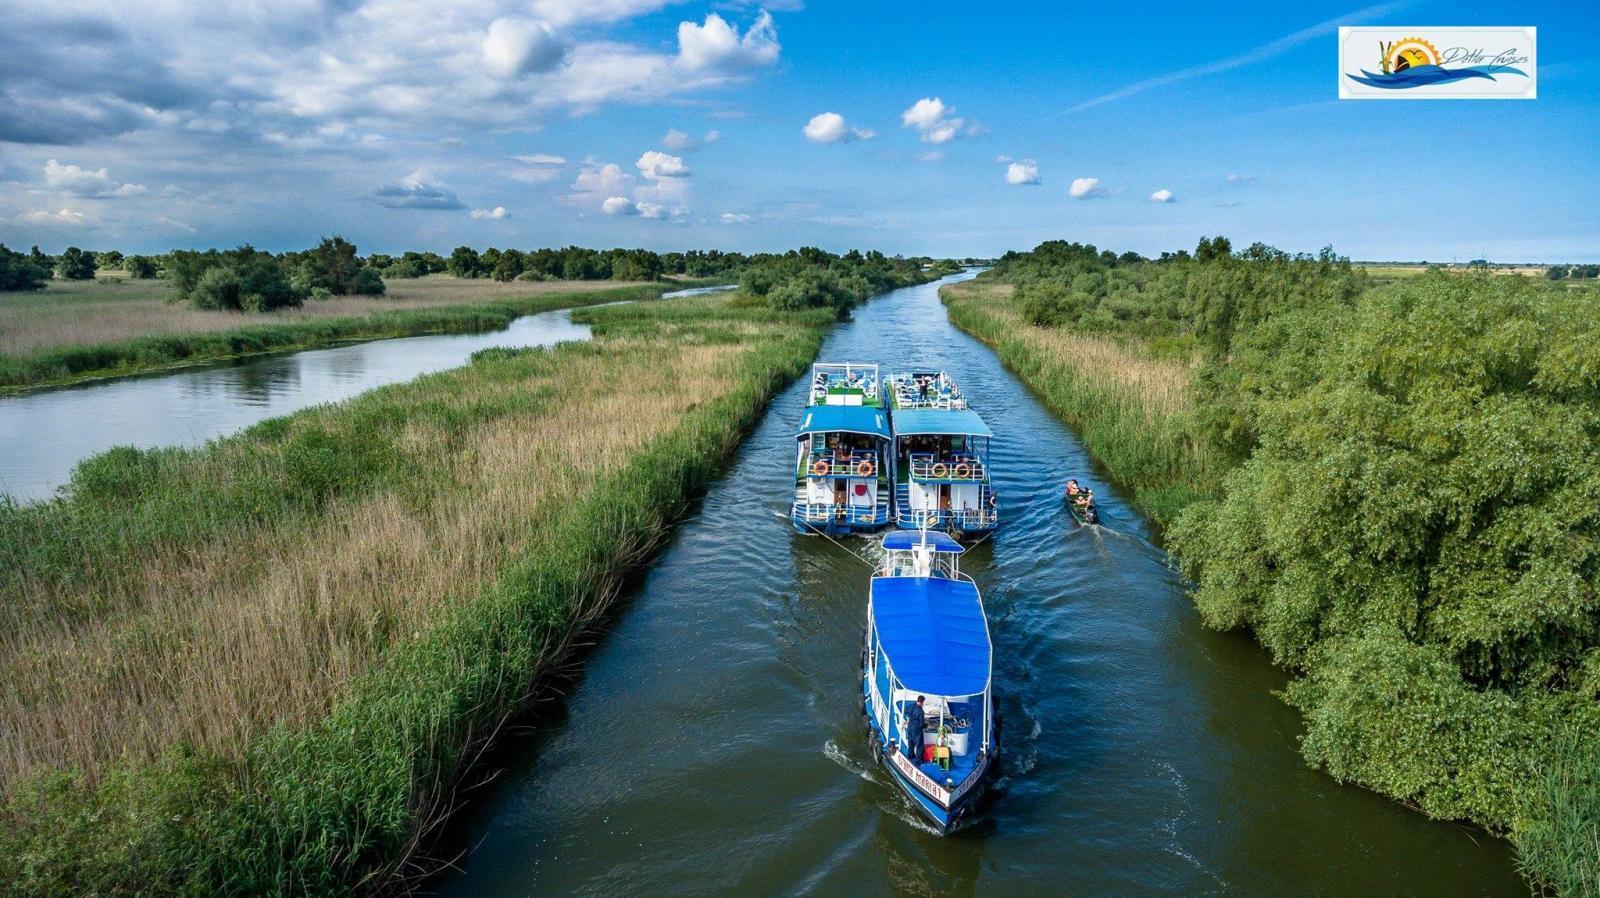 pachet turistic de paste pe hotel plutitor in delta dunarii